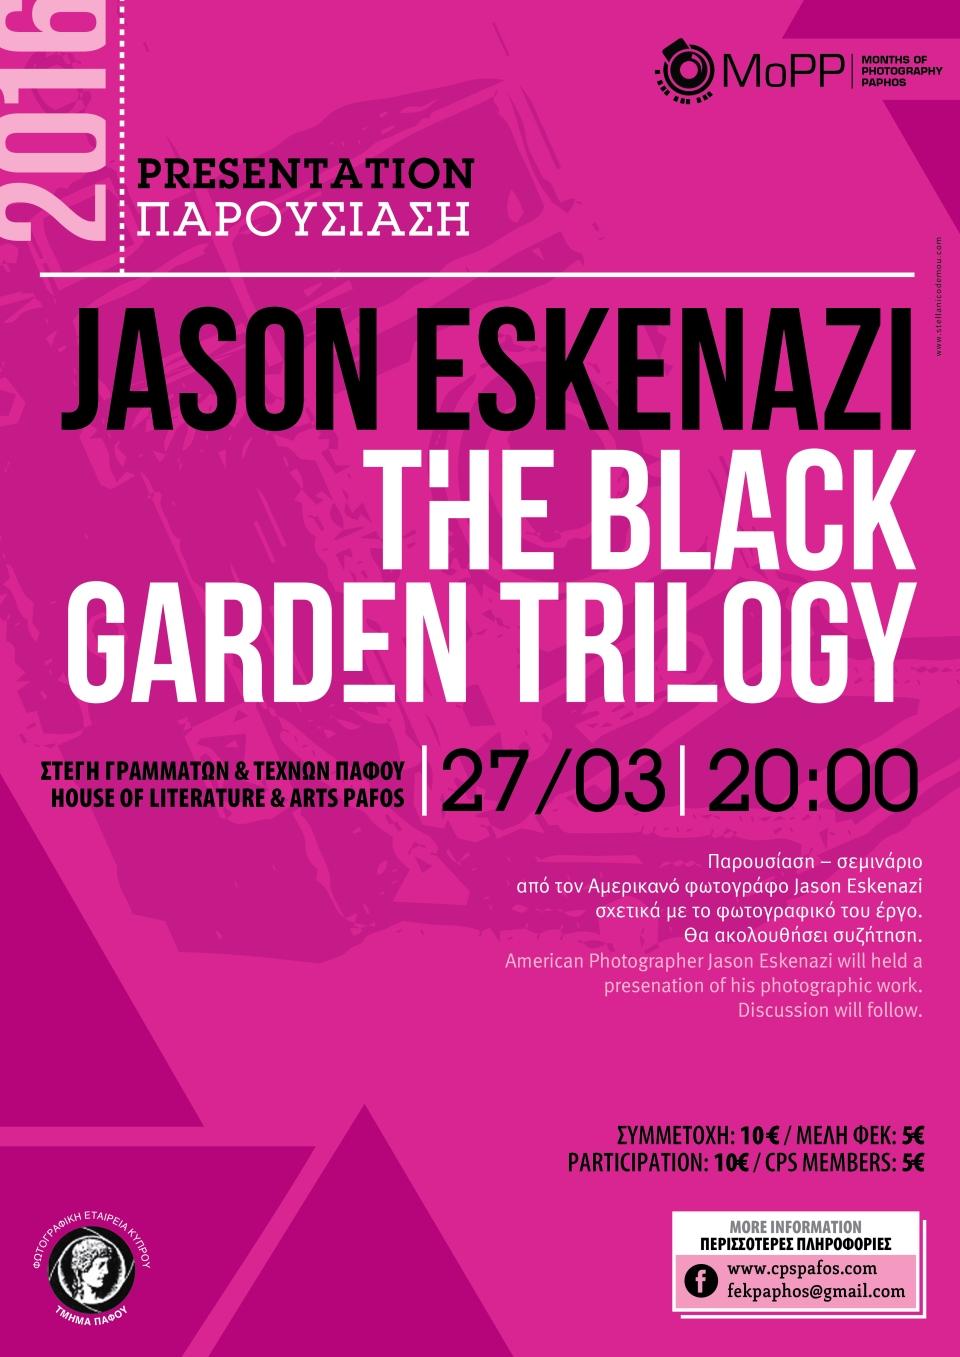 BlackGarden-Trilogy-01